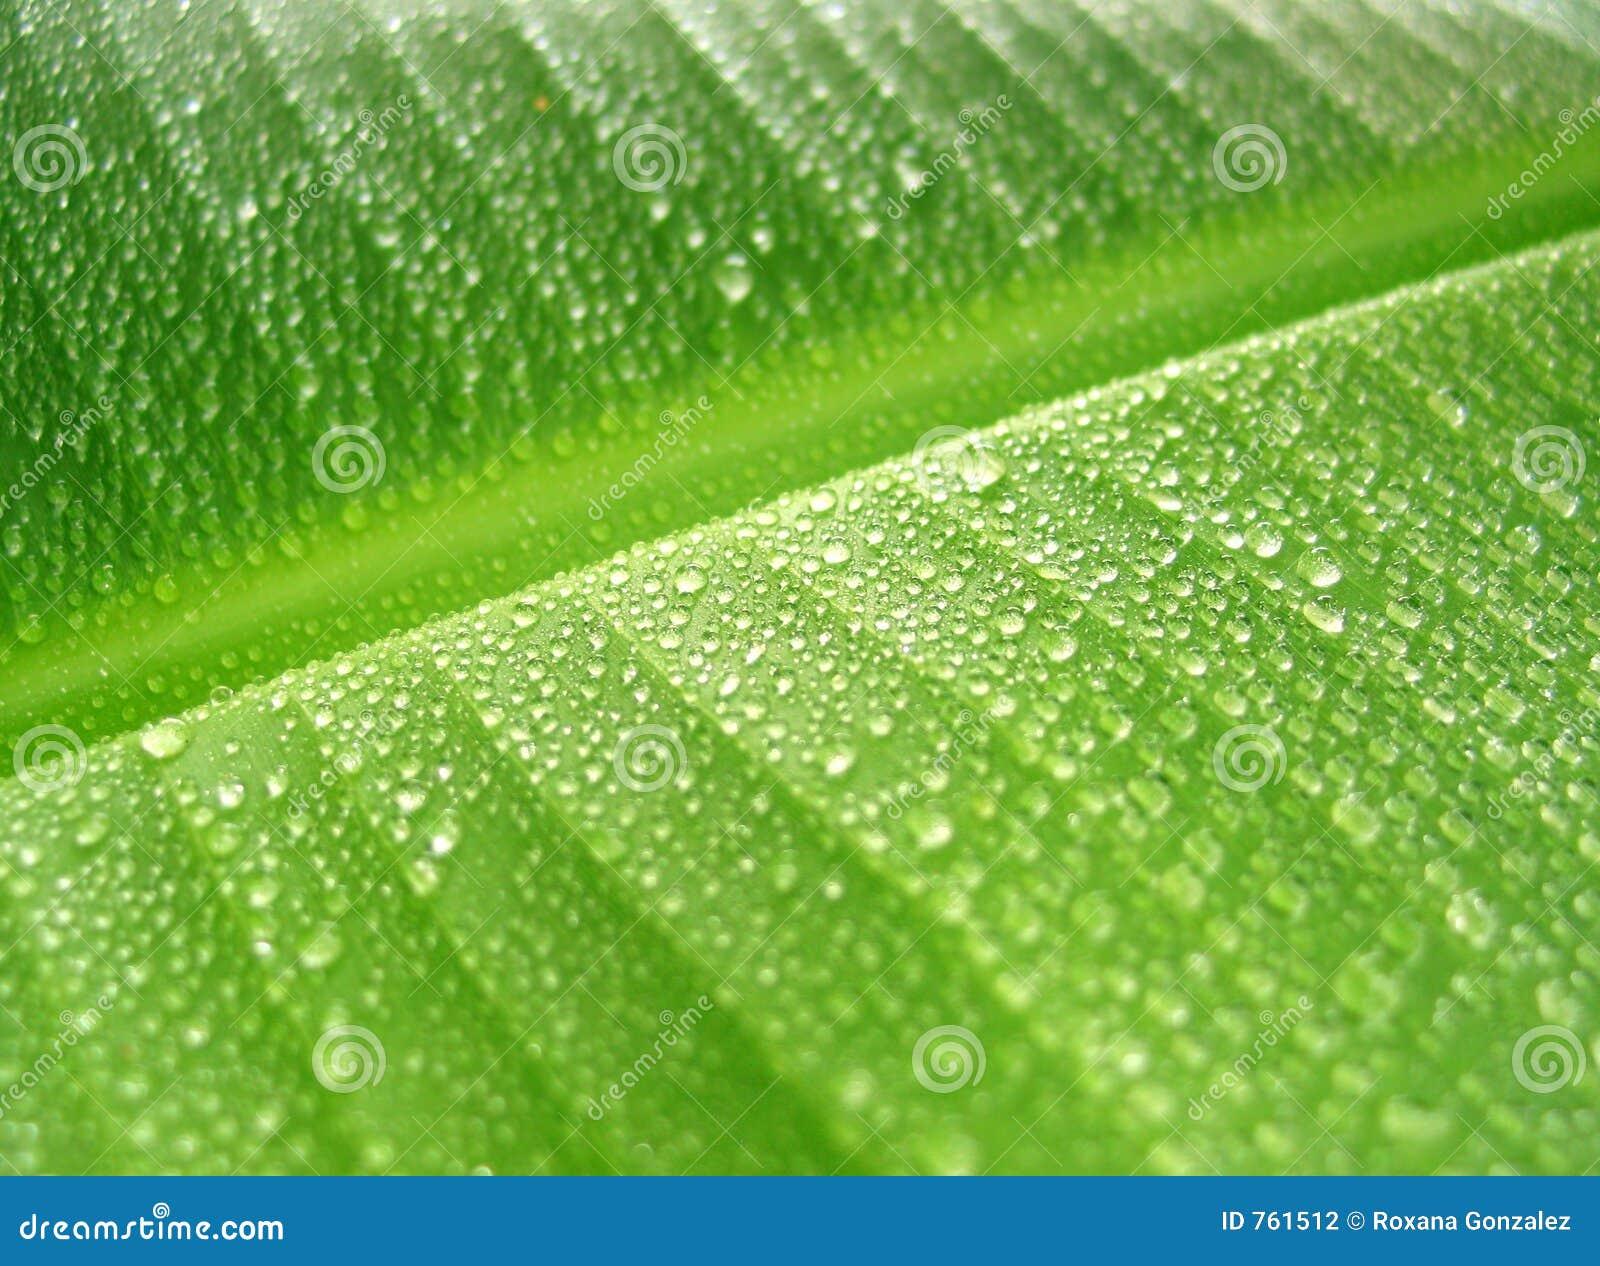 Rain Drops On Banana Leaf Stock Photography - Image: 761512